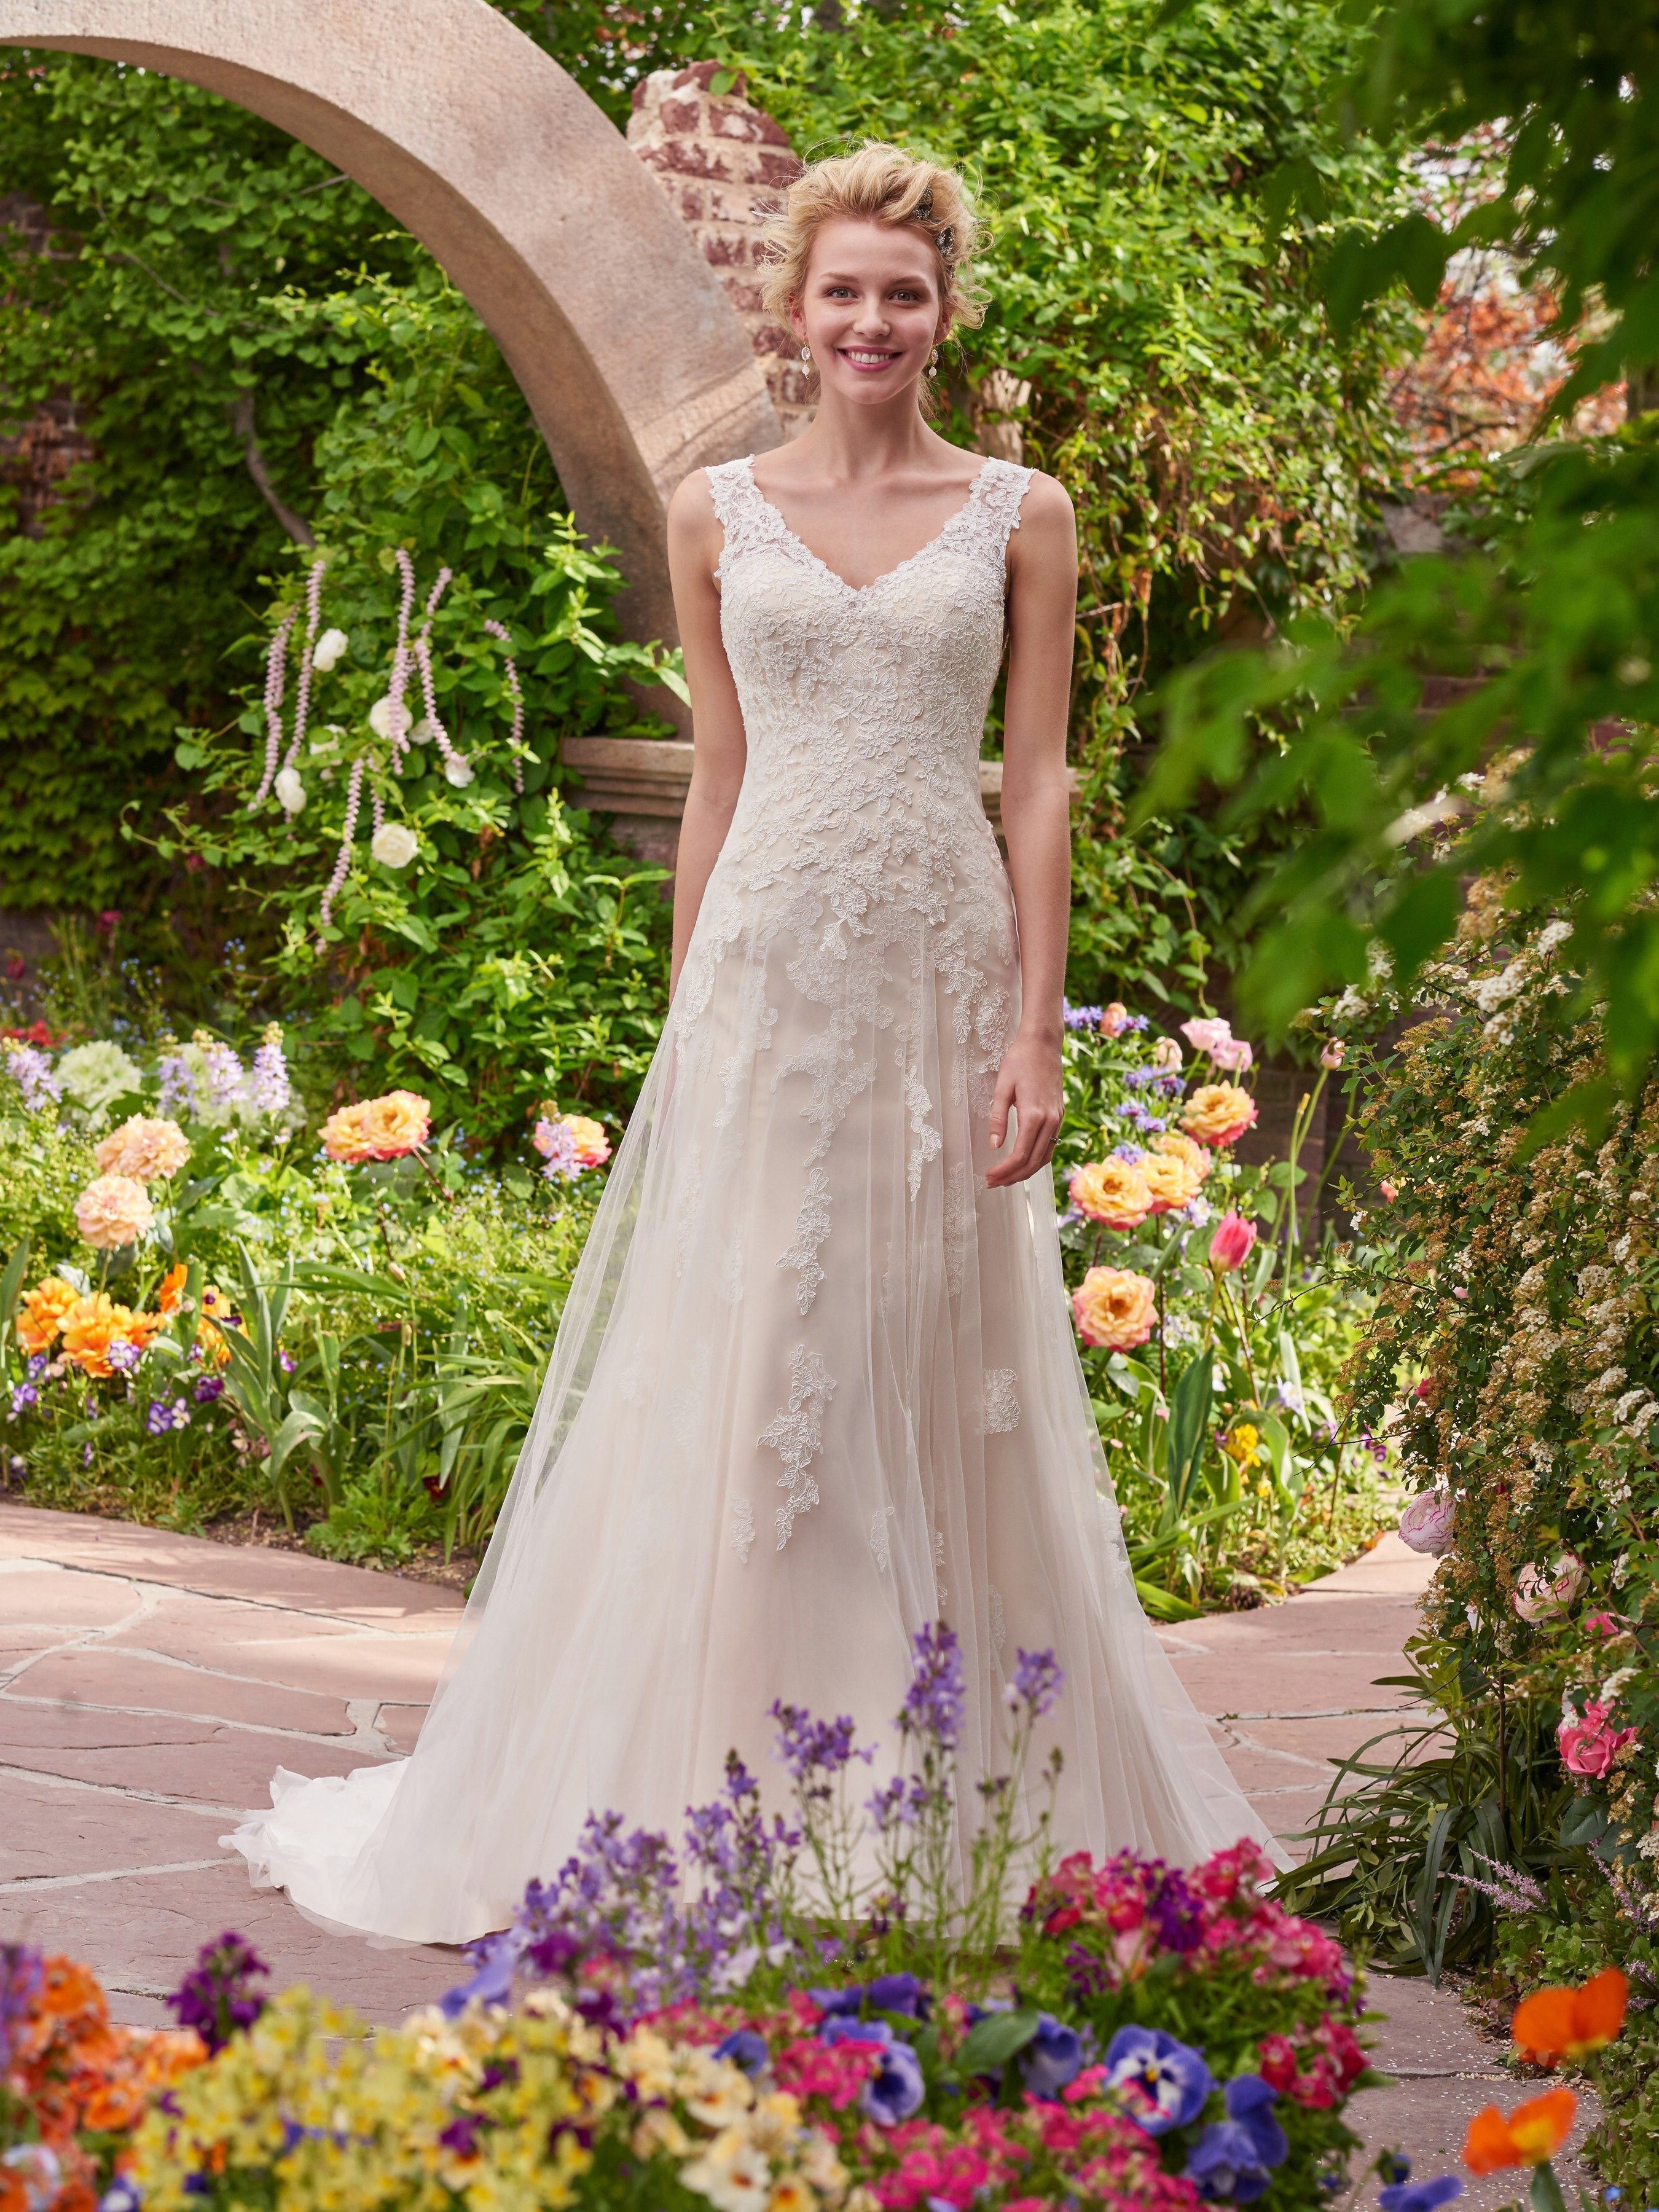 Simple lace dress styles  Wedding Dresses Bridesmaid Dresses Prom Dresses and Bridal Dresses